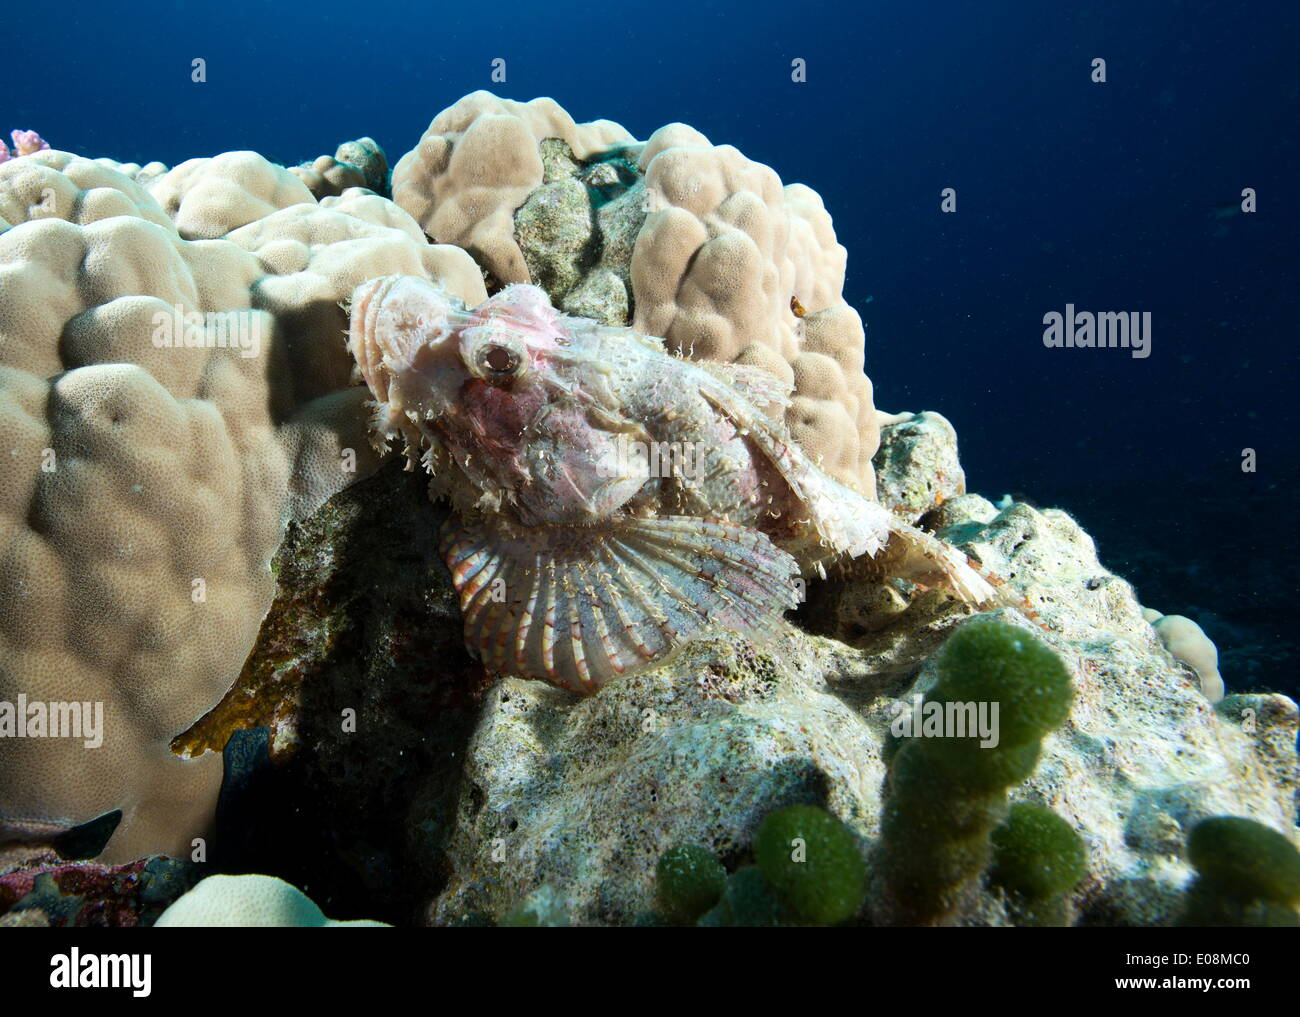 Small scale scorpionfish (Scorpaenopsis oxycephala) (Tassled scorpionfish) in the Red Sea, Marsa Alam, Egypt, North Africa, Africa - Stock Image